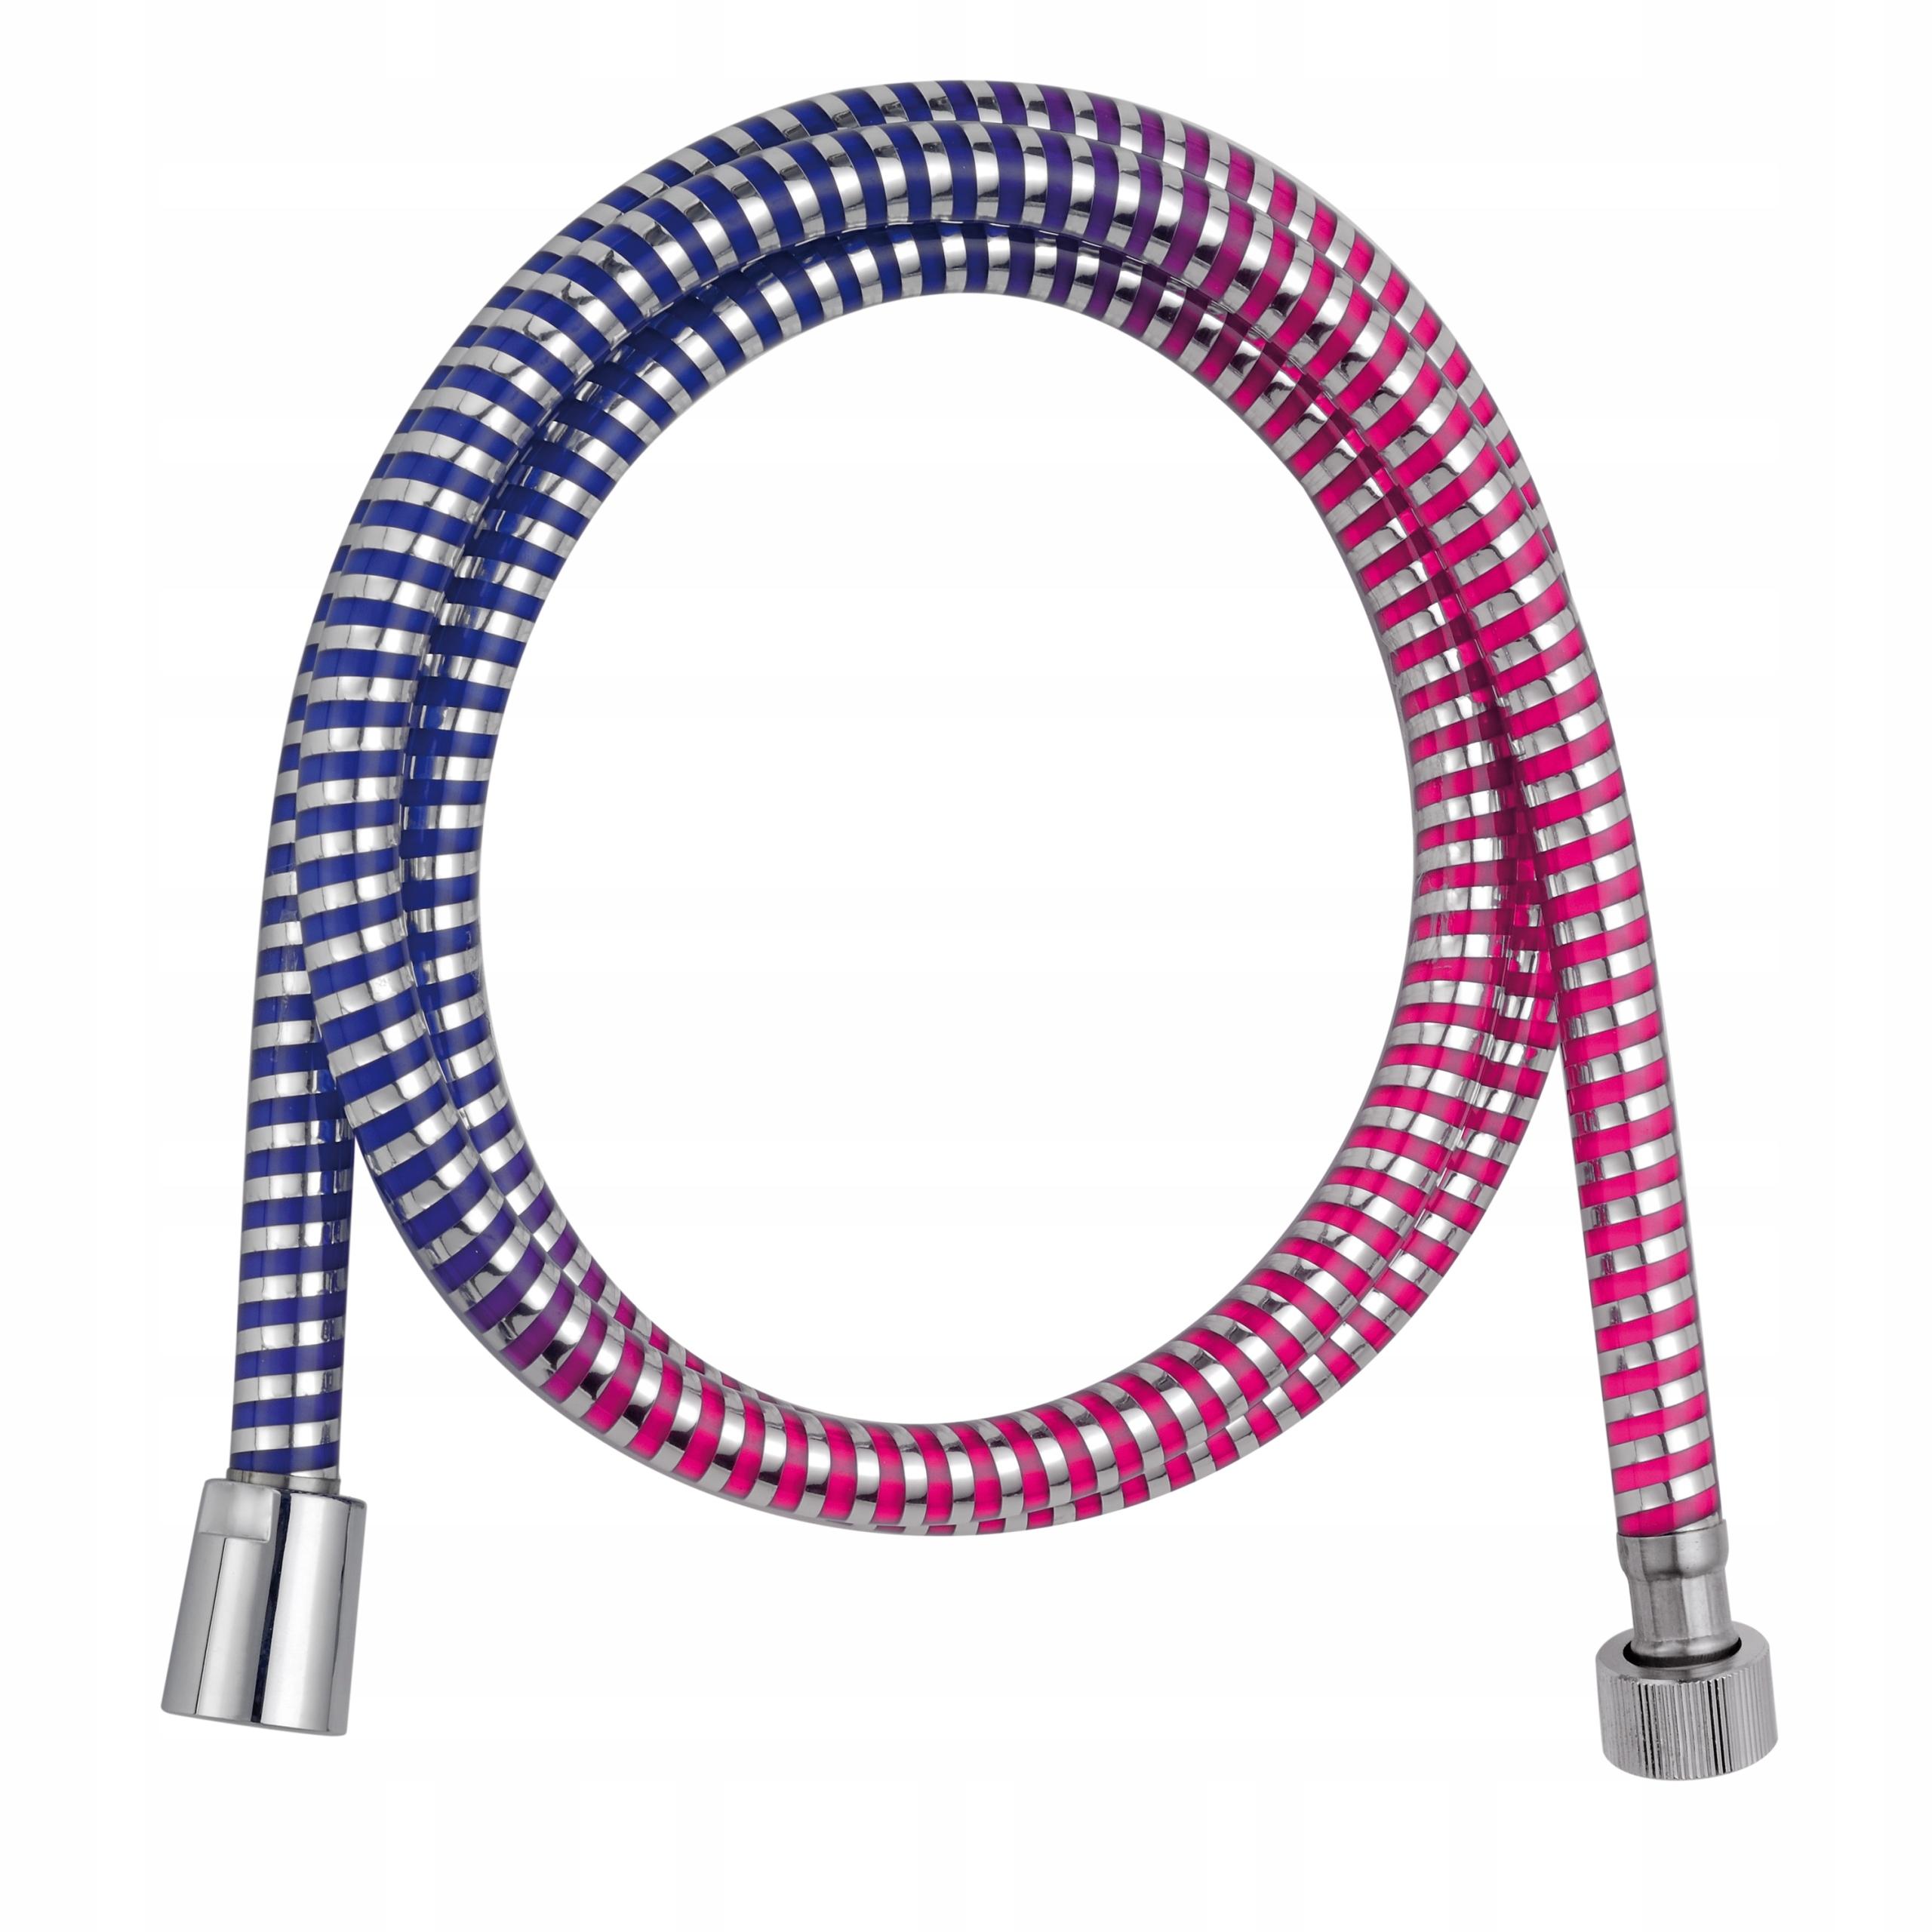 Sprchové hadice 150 EXT MULTI farby